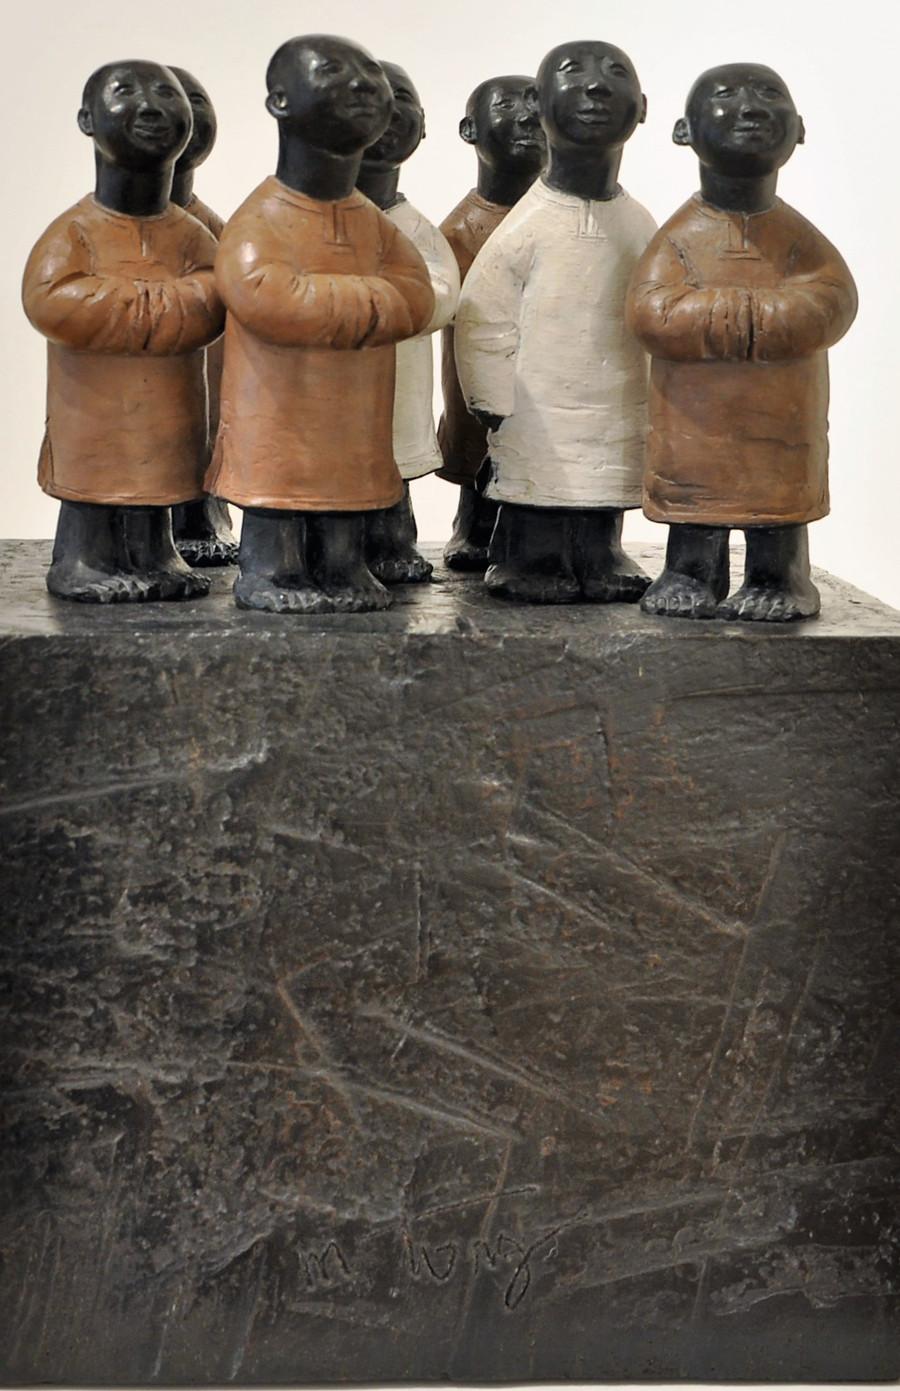 02-mingtong sculpteur (terre cuite).jpg